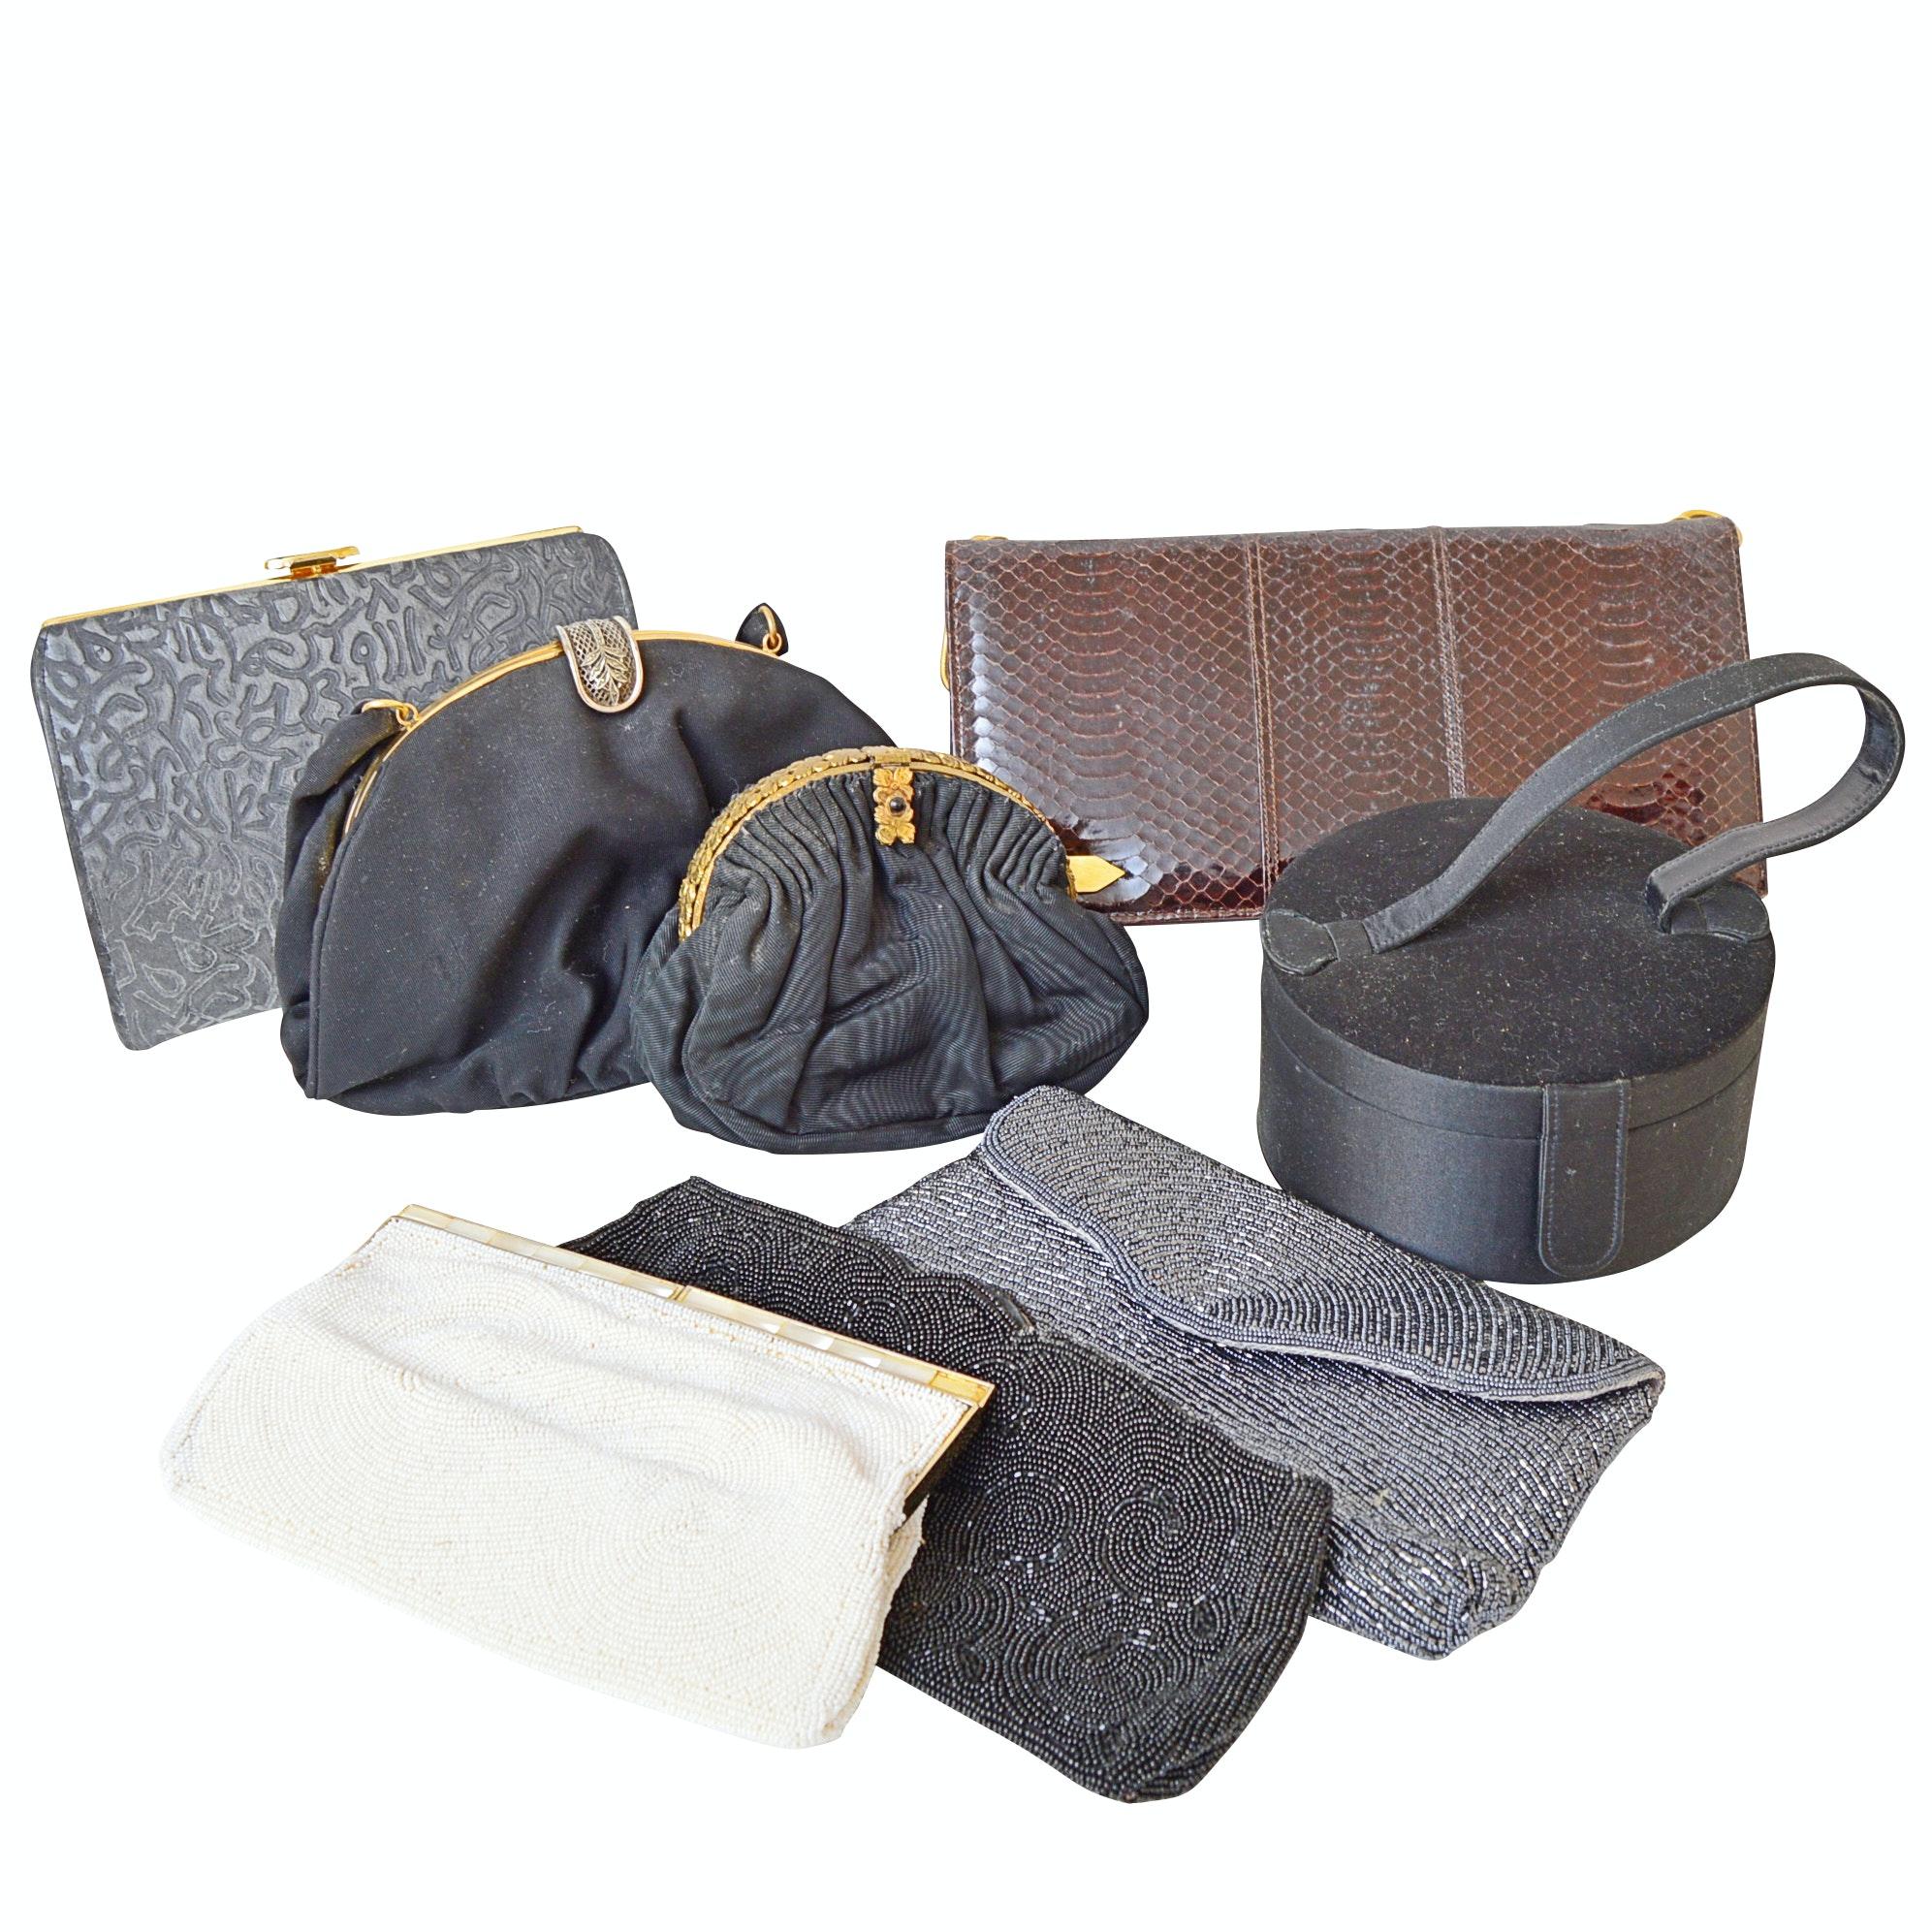 Vintage Beaded, Snakeskin and Fabric Handbags